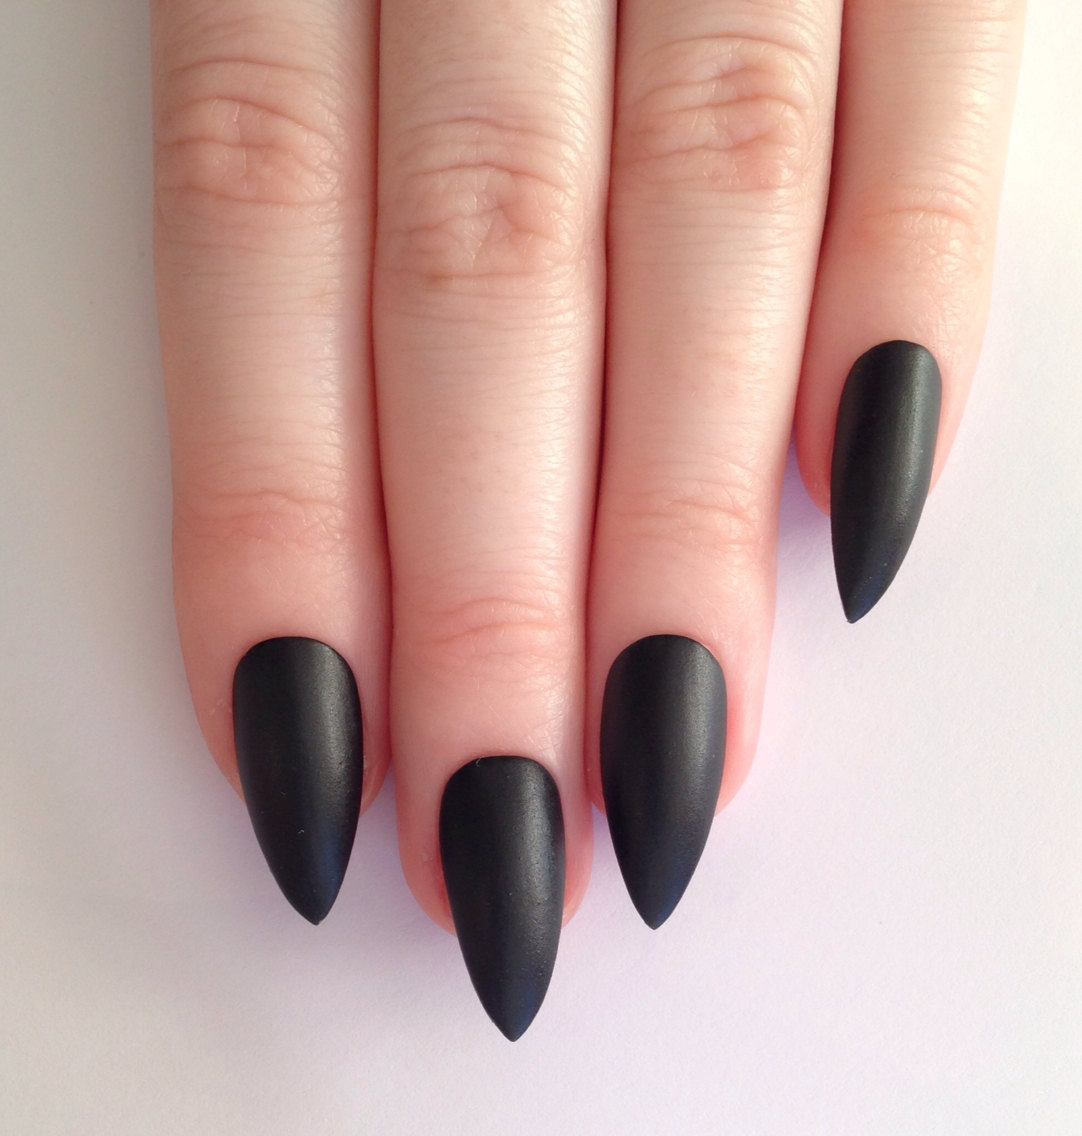 stiletto acrylic nails black photo - 1